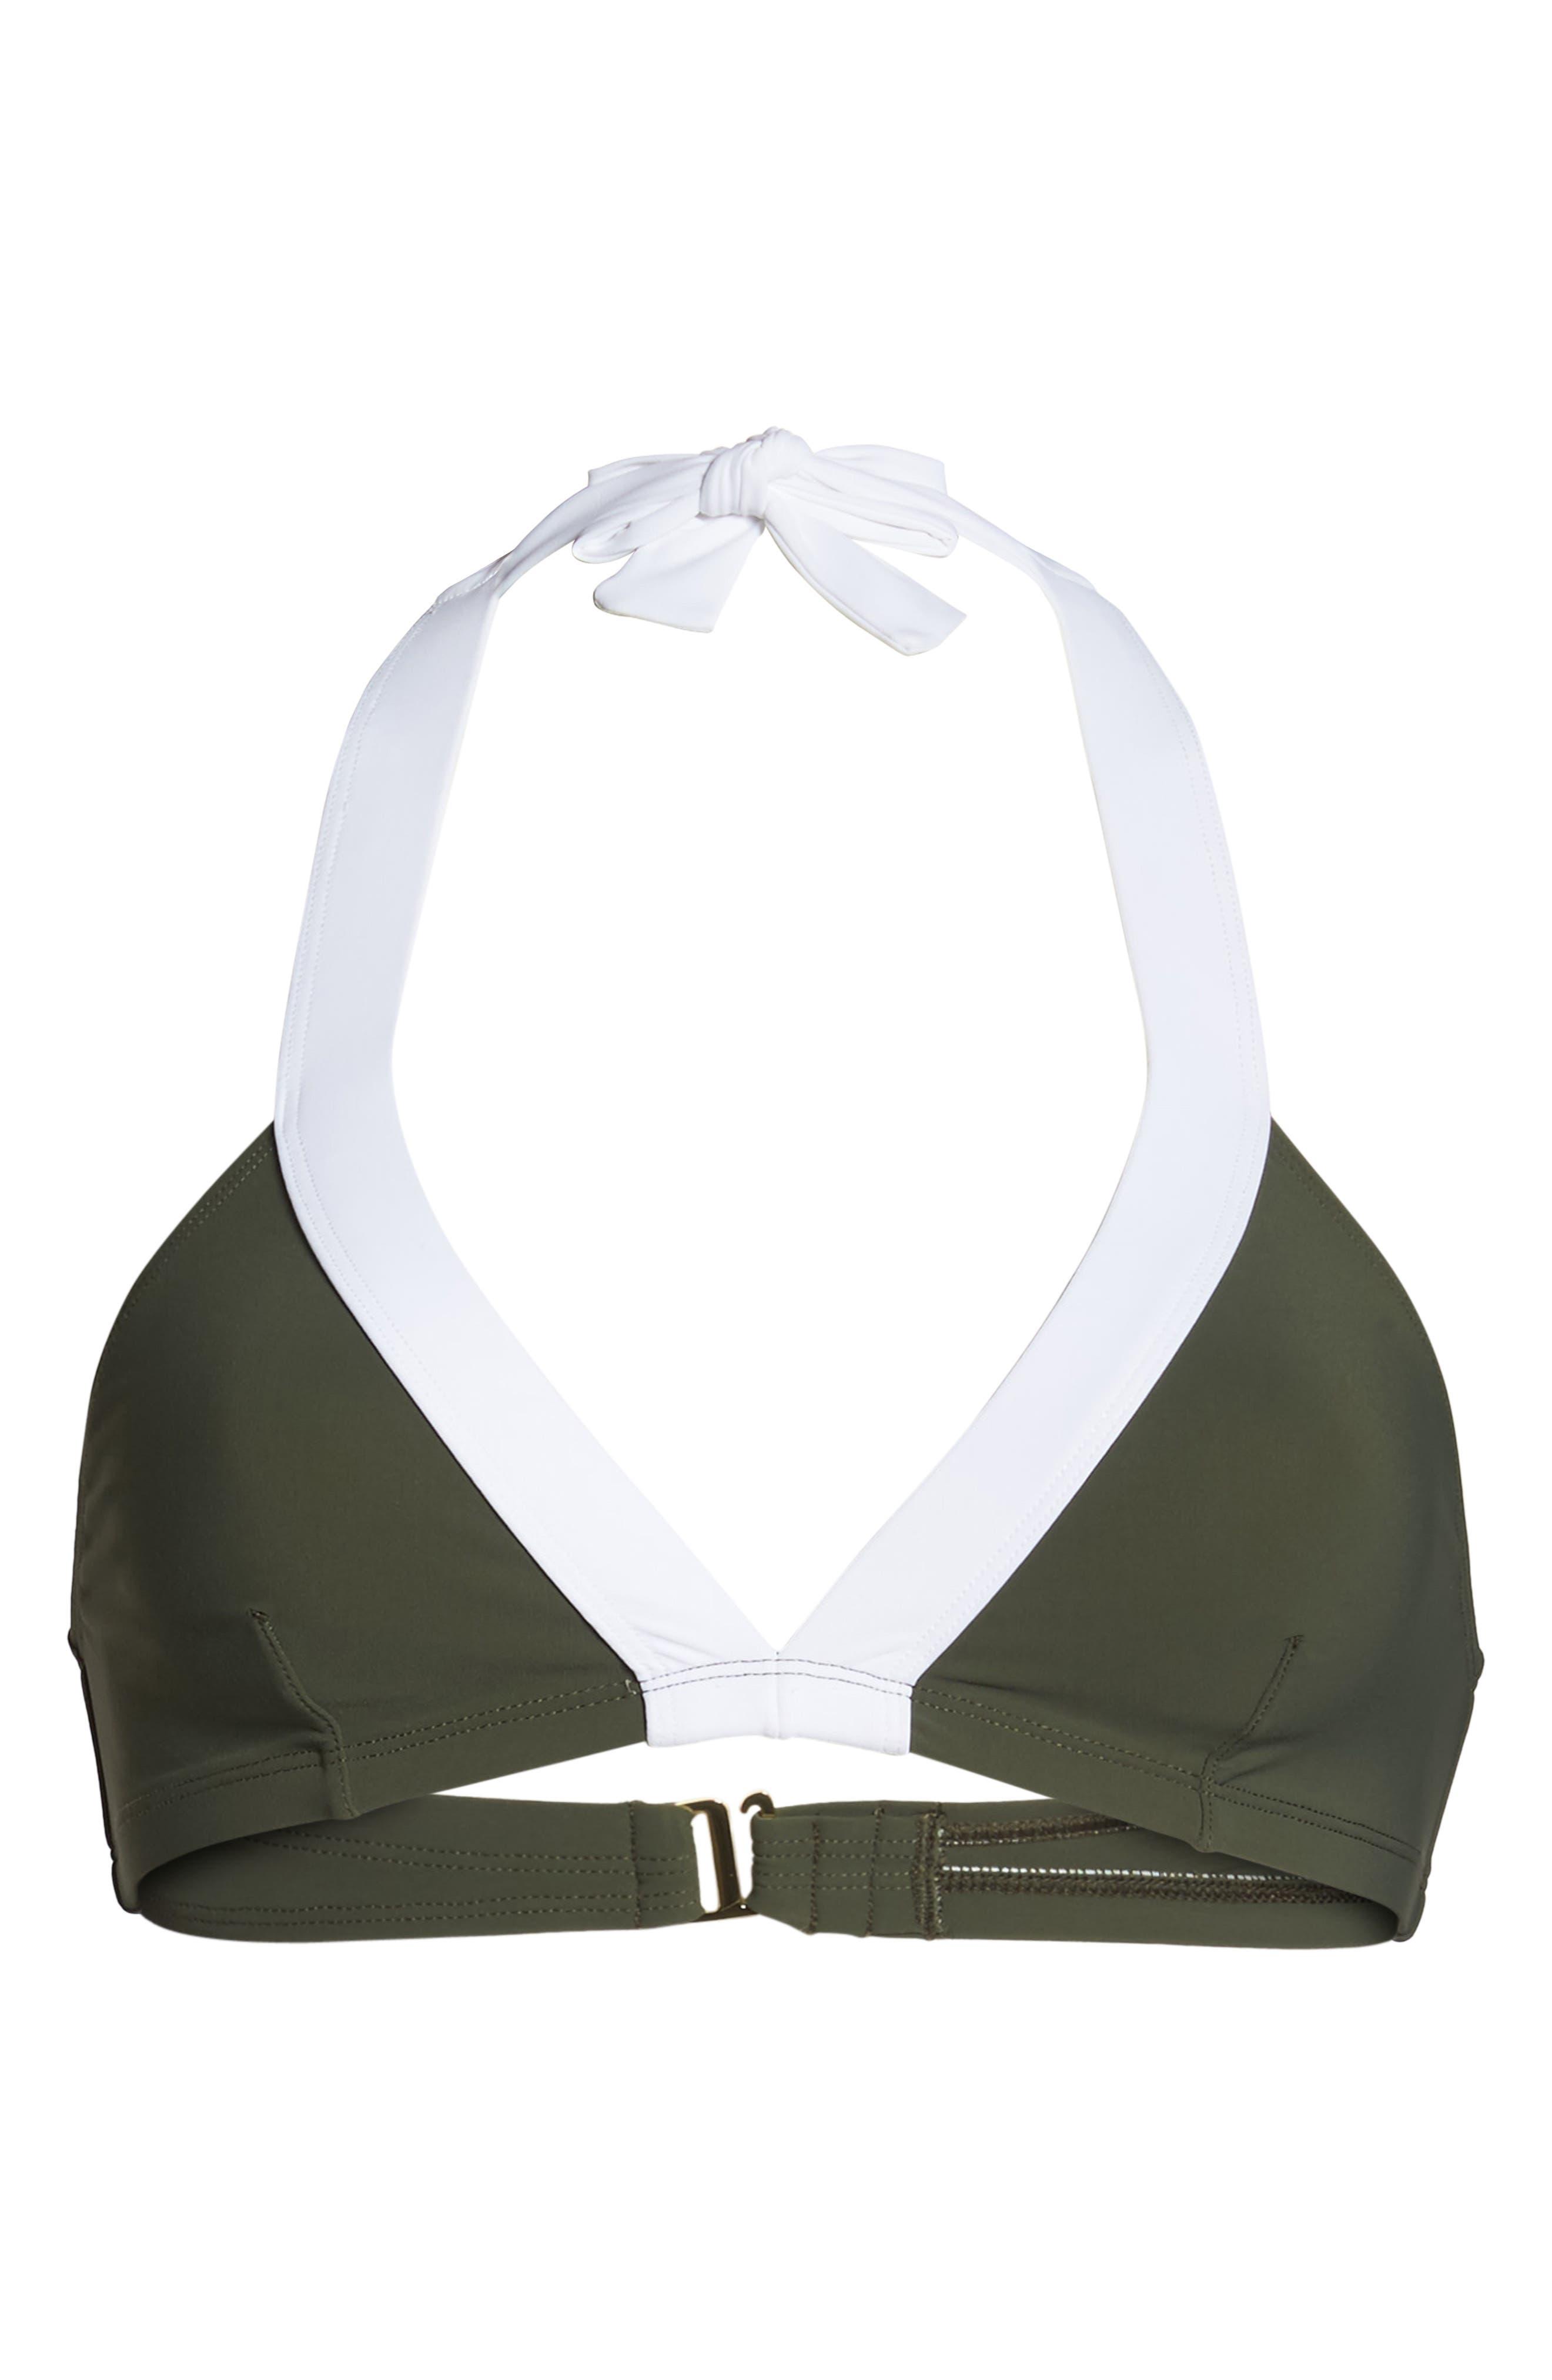 Banded Halter Bikini Top,                             Alternate thumbnail 6, color,                             Camo/ White